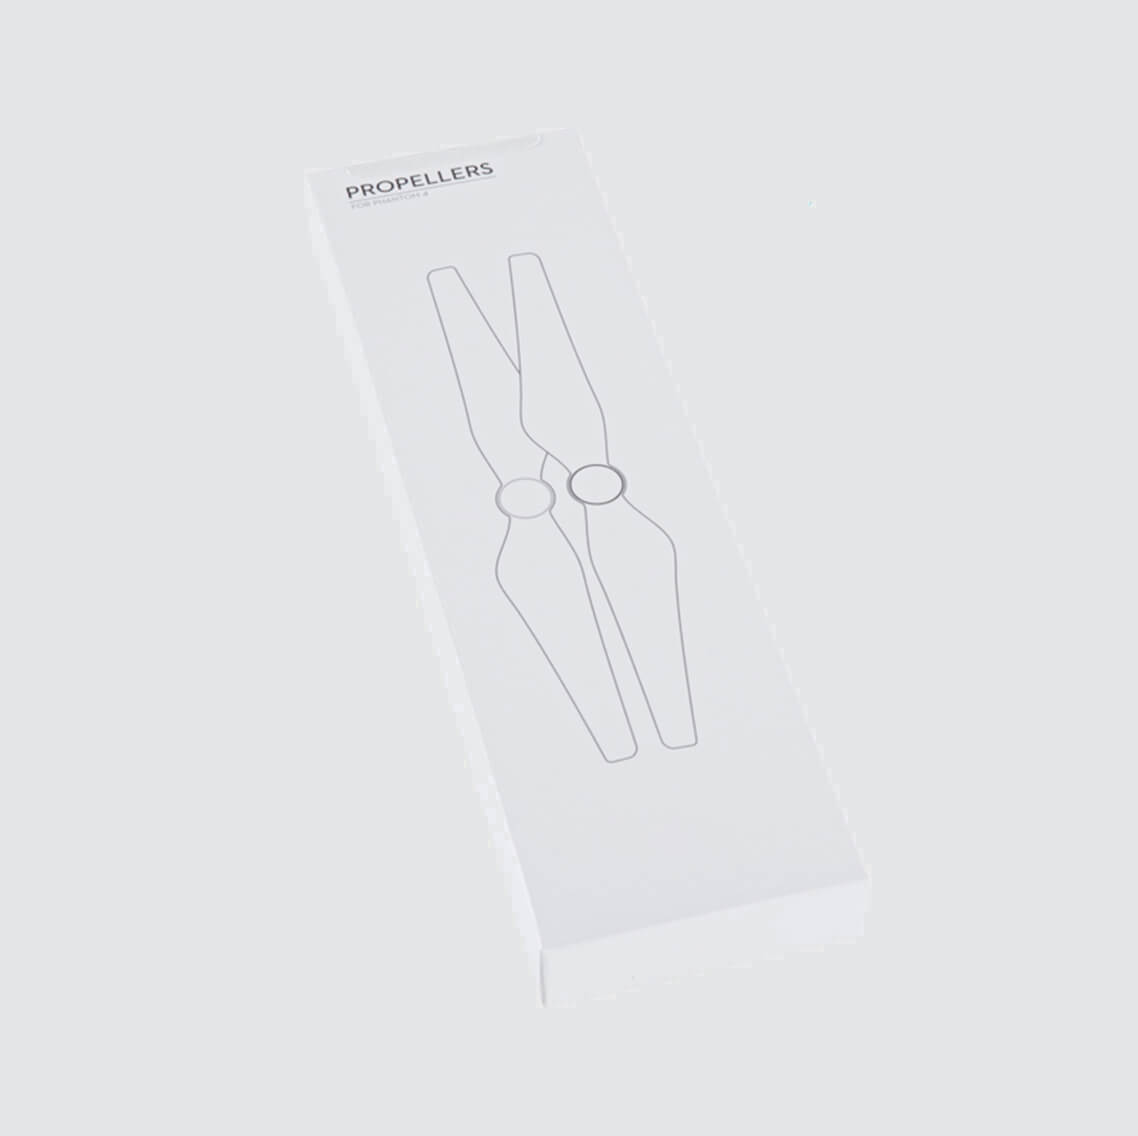 DJI Phantom 4 Series – Quick Release Propellers